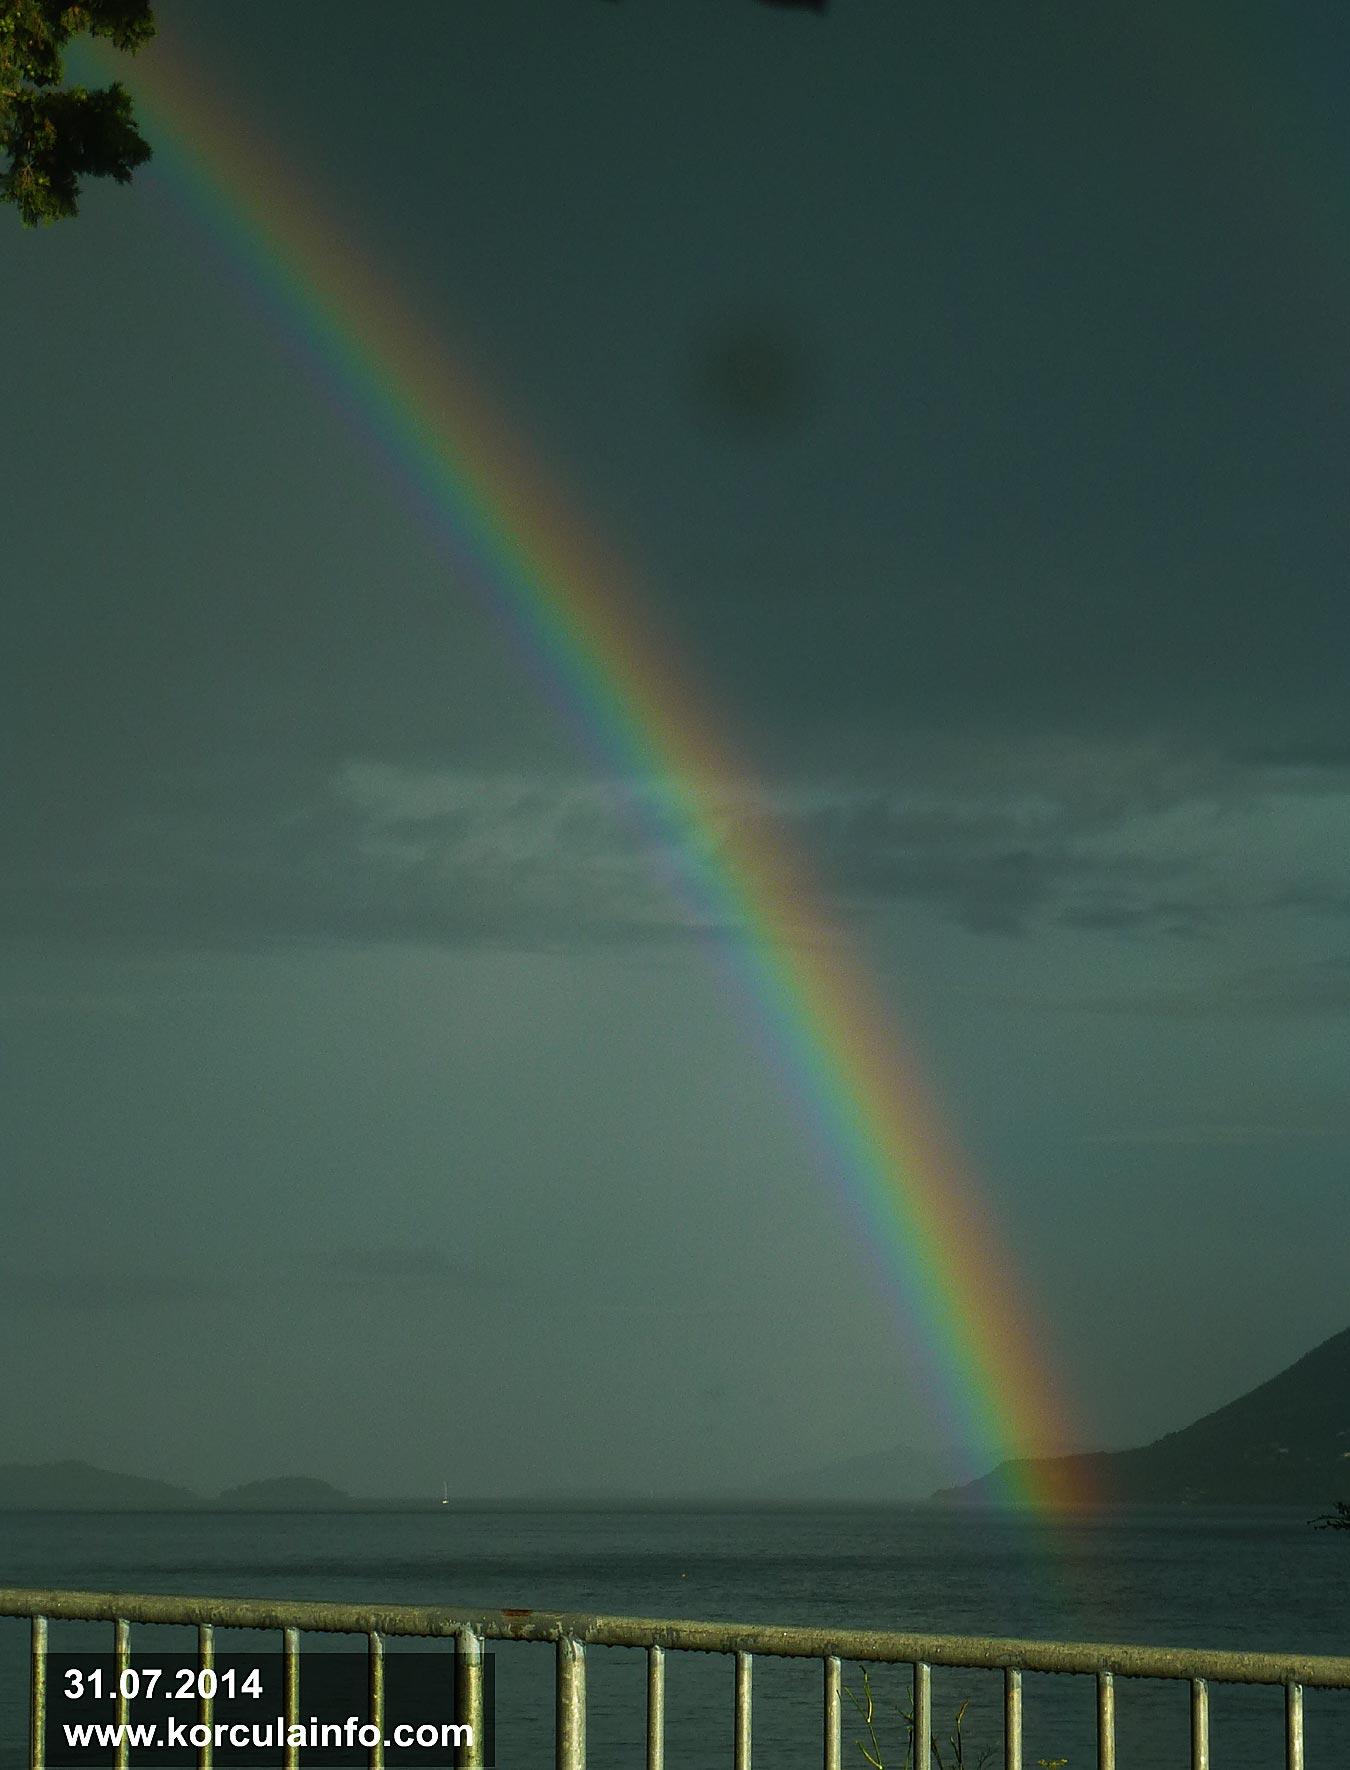 Rainbow over Korcula (2014)